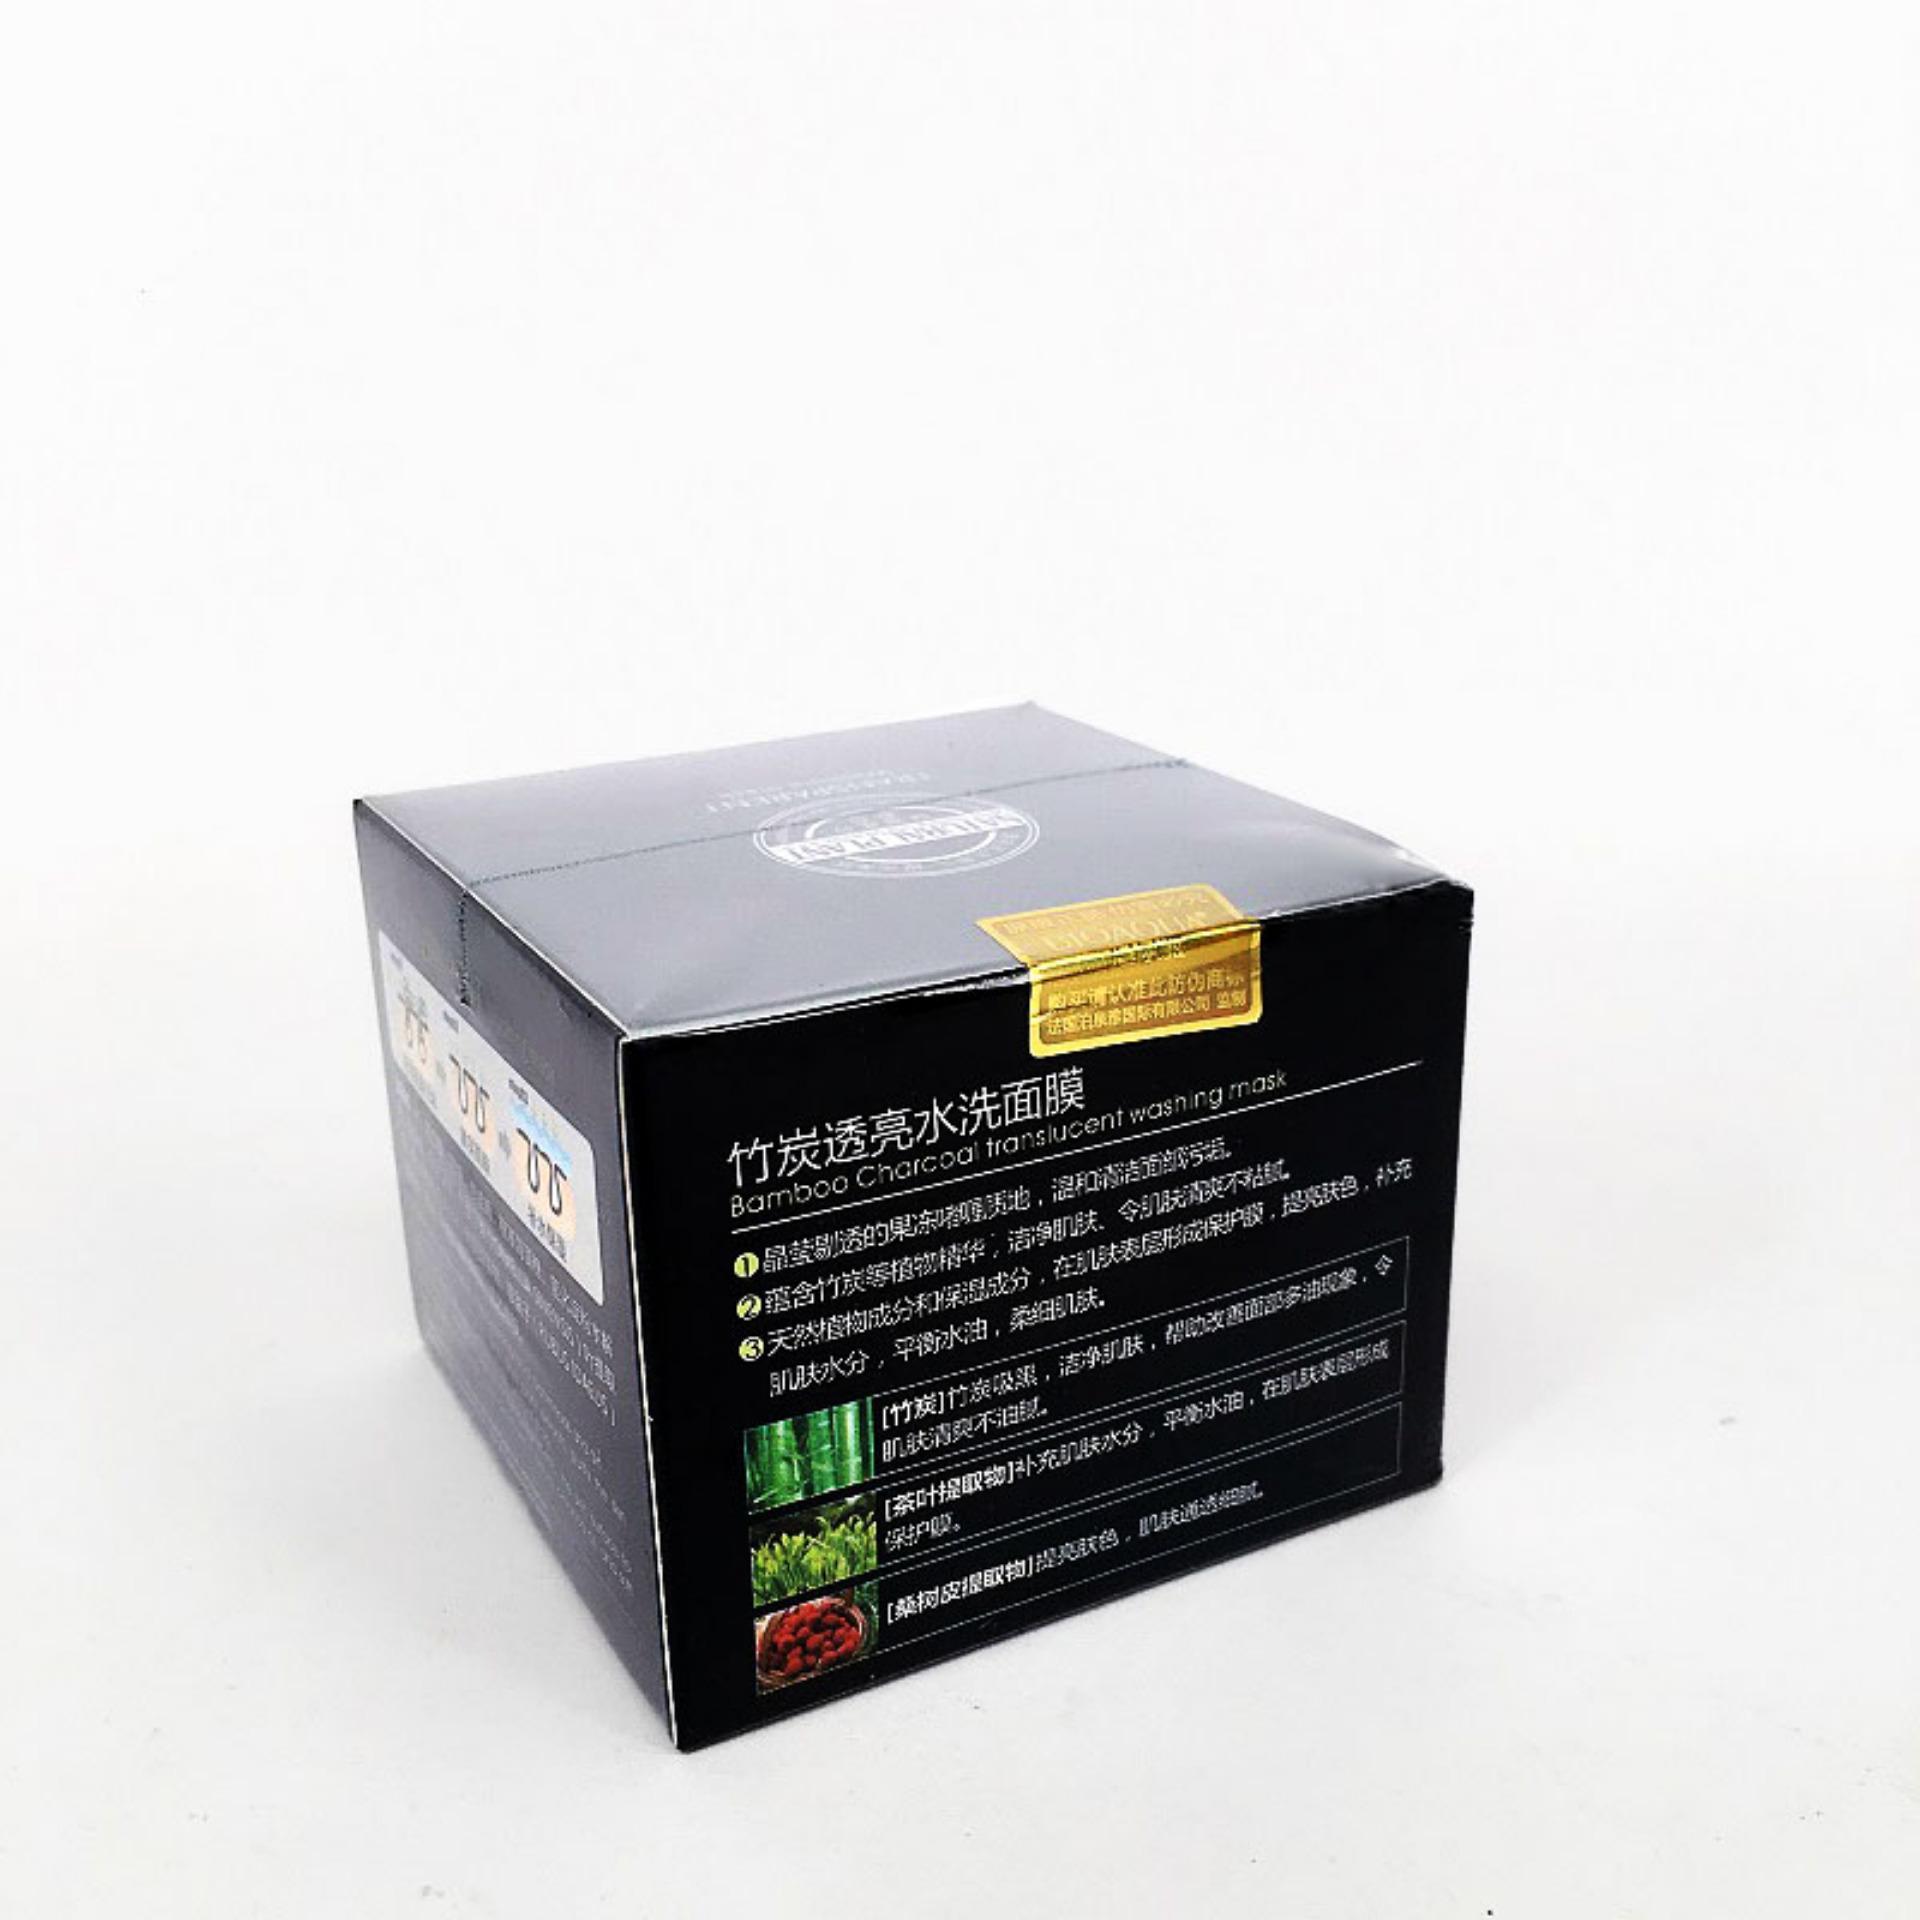 Pelacakan Harga Bioaqua Bamboo Charcoal Translucent Washing Mask Masker Bambu